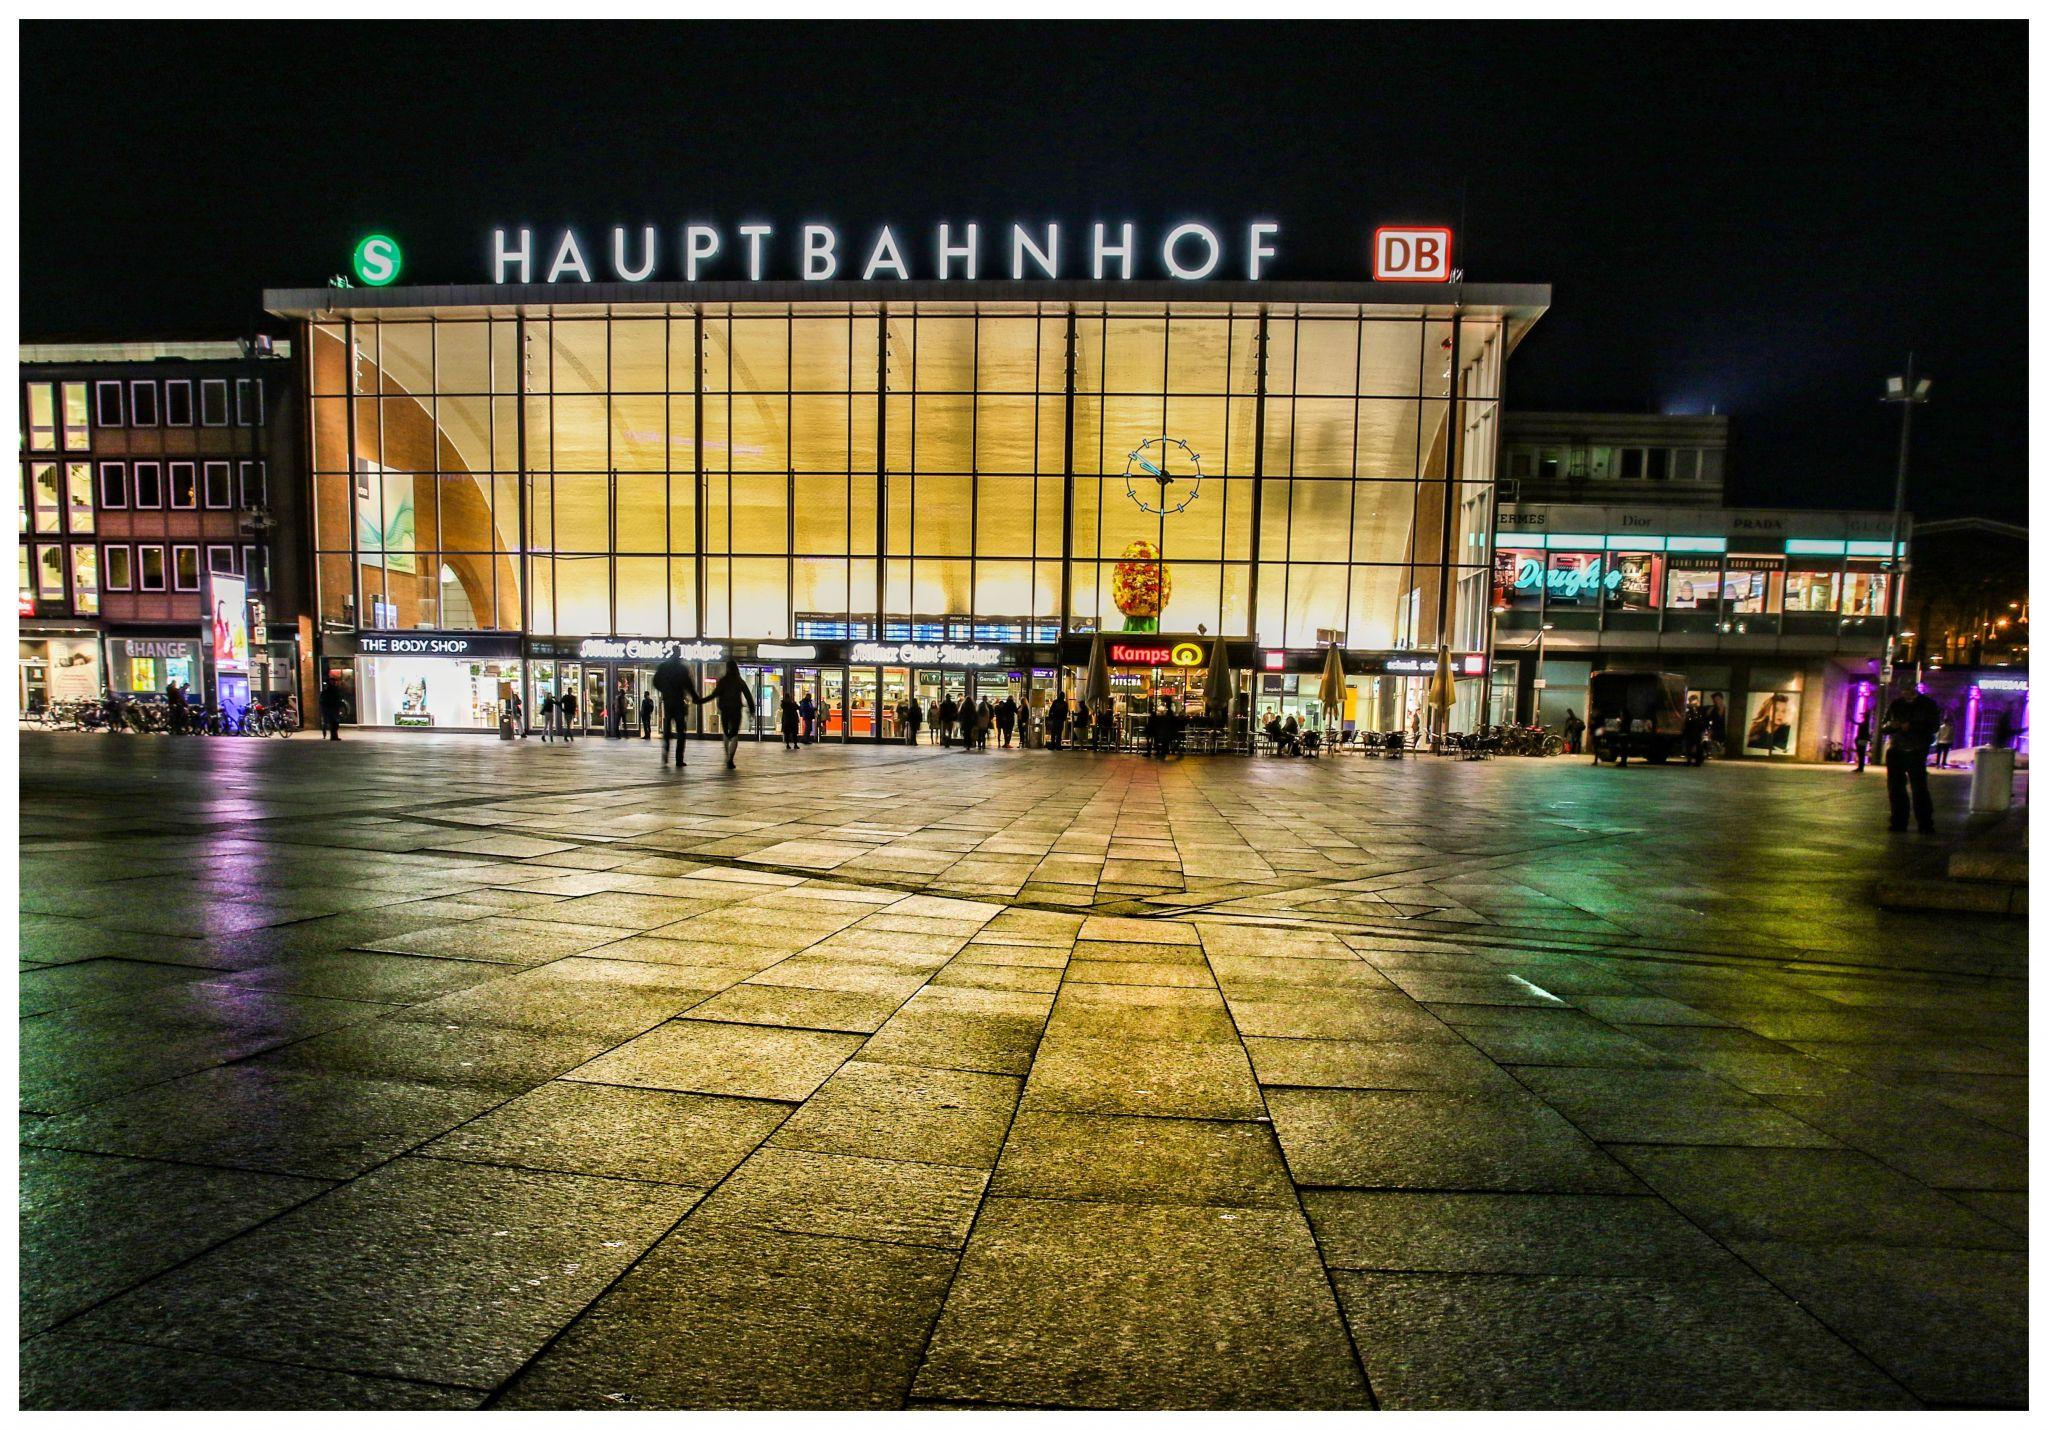 Hauptbahnhof/Central Statio, Germany